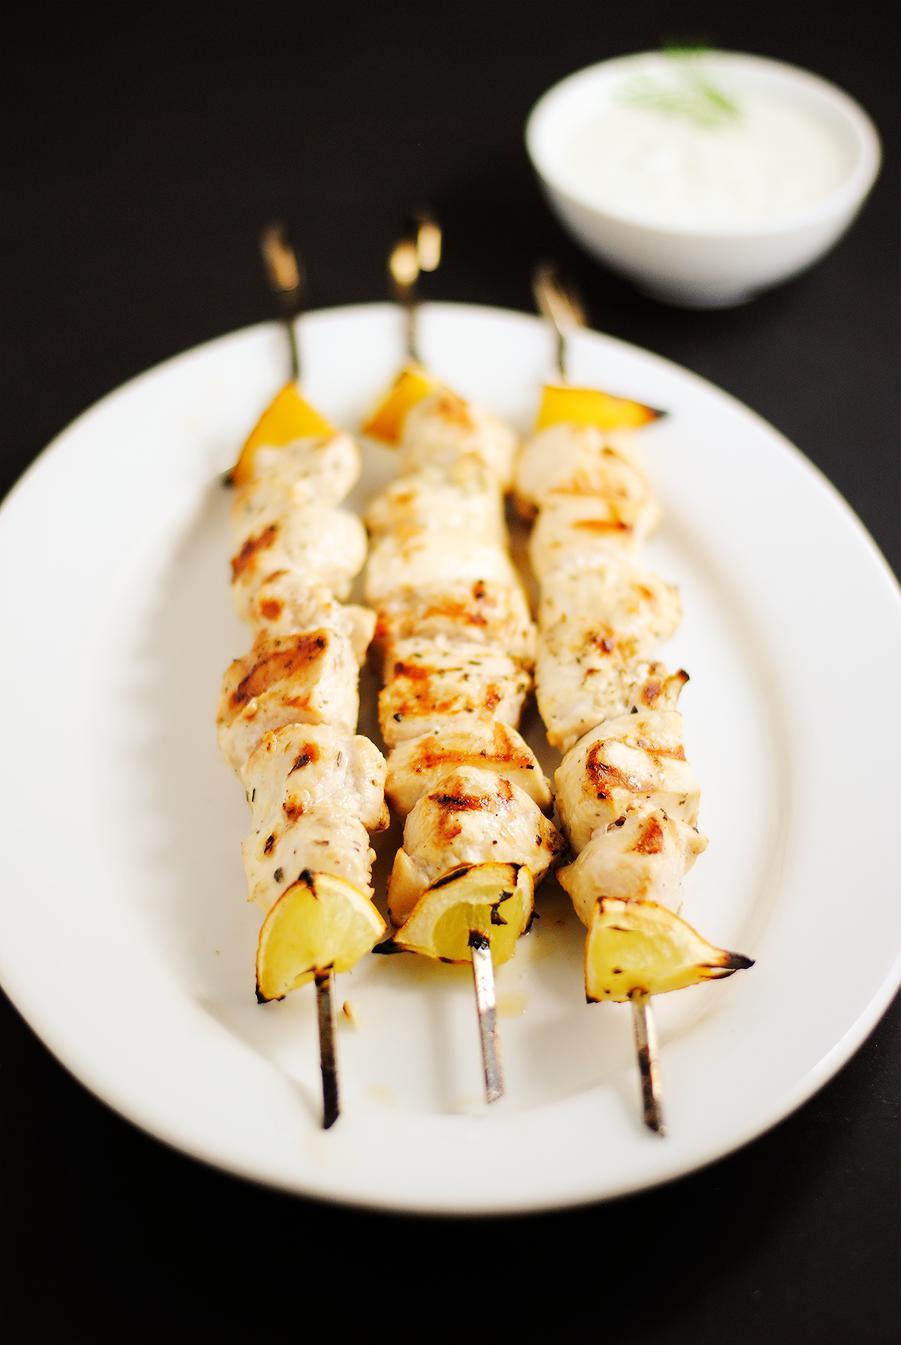 Chicken souvlaki with homemade tzatziki